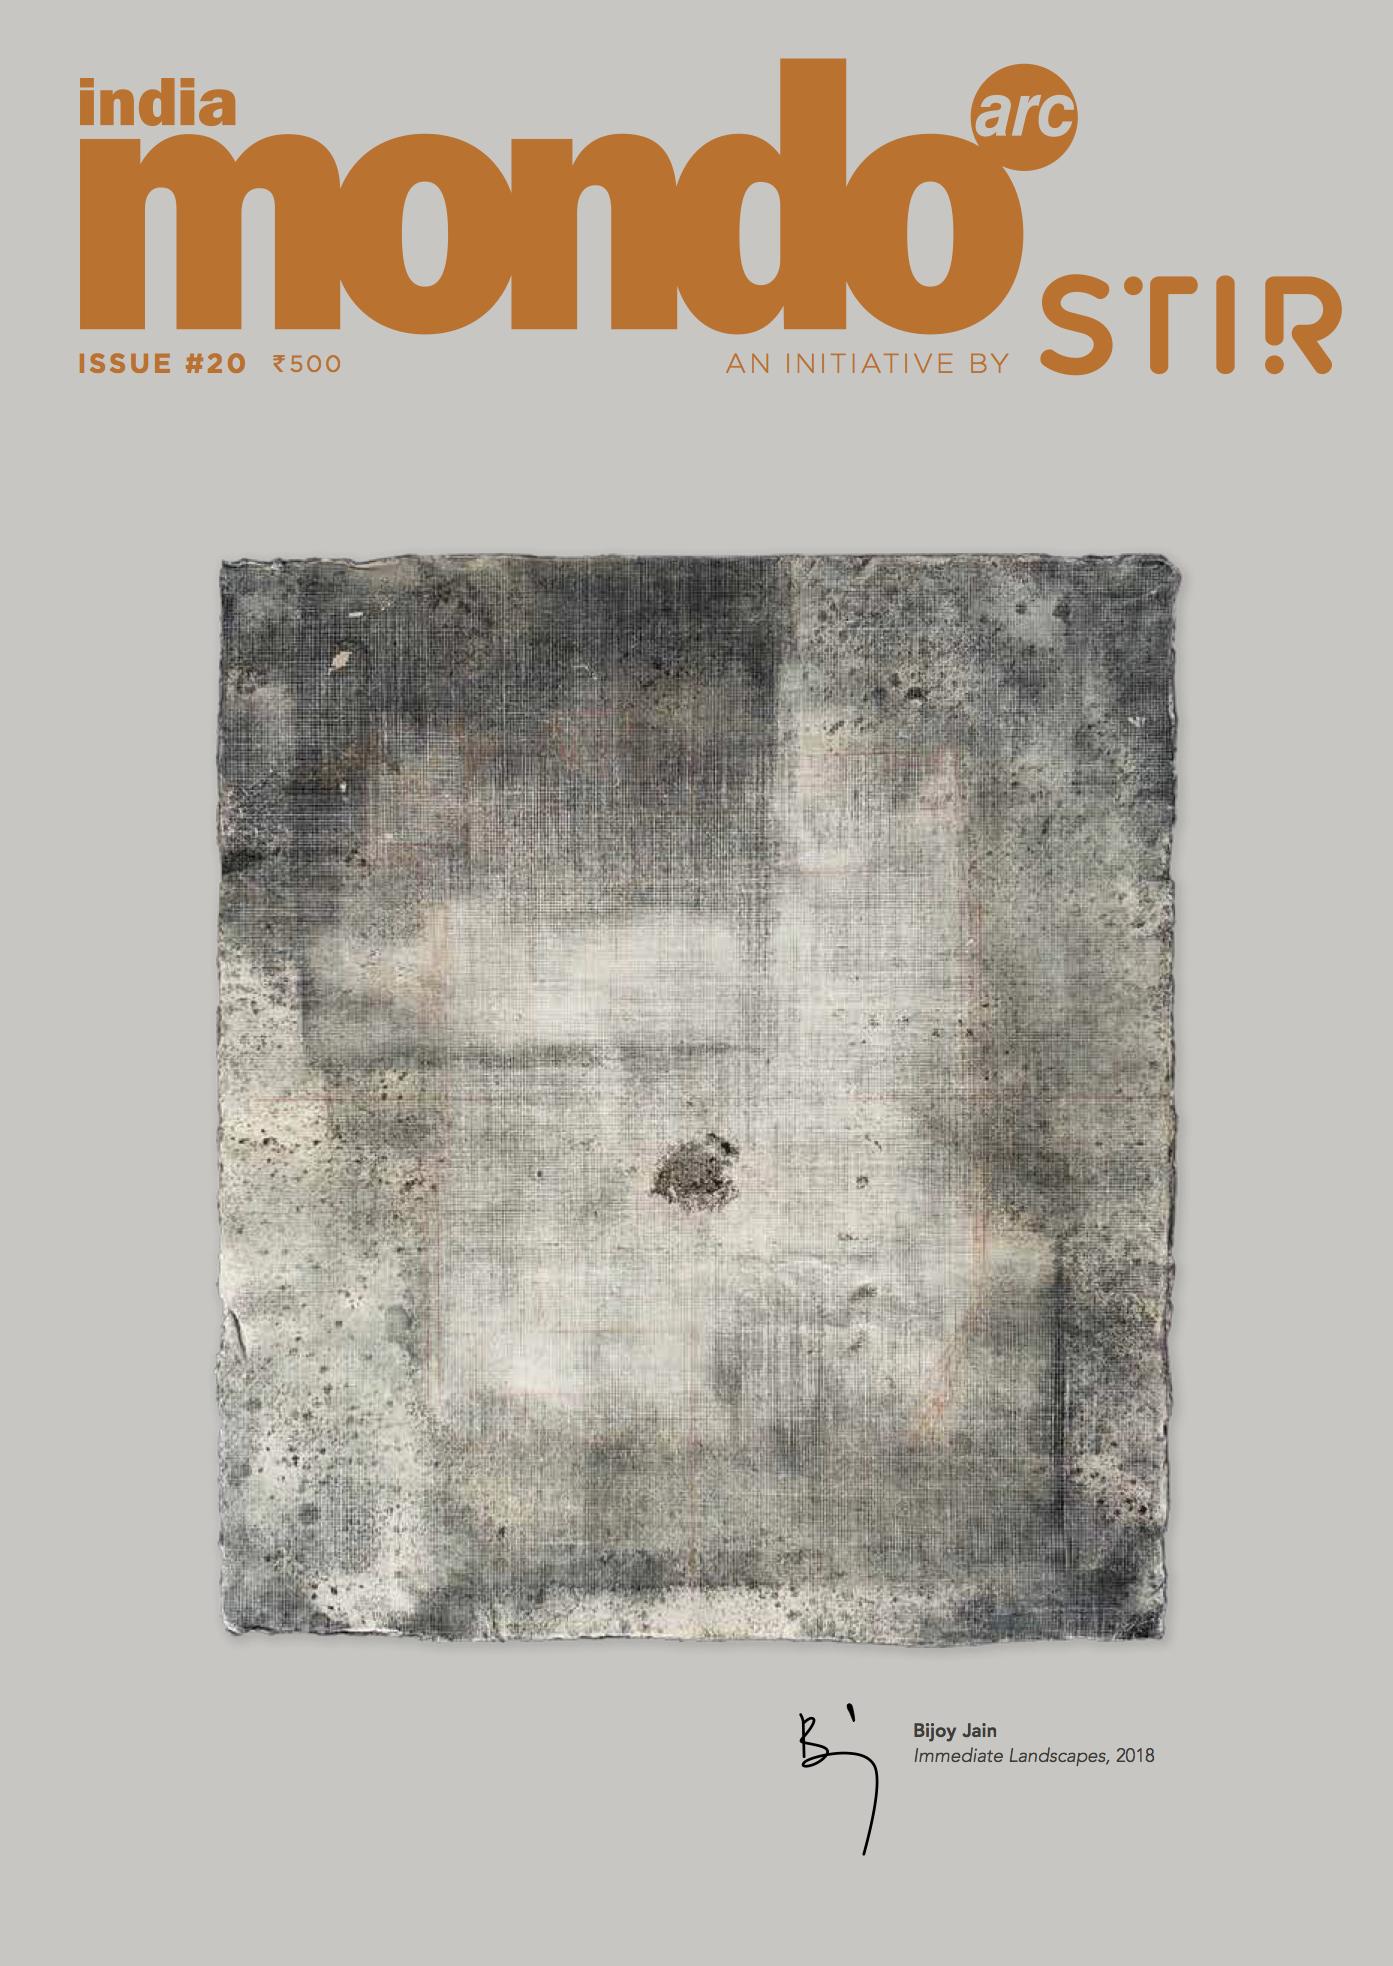 mondoarcindia Issue #20-Review-Salone del Mobile_Sandeep Khosla.jpg